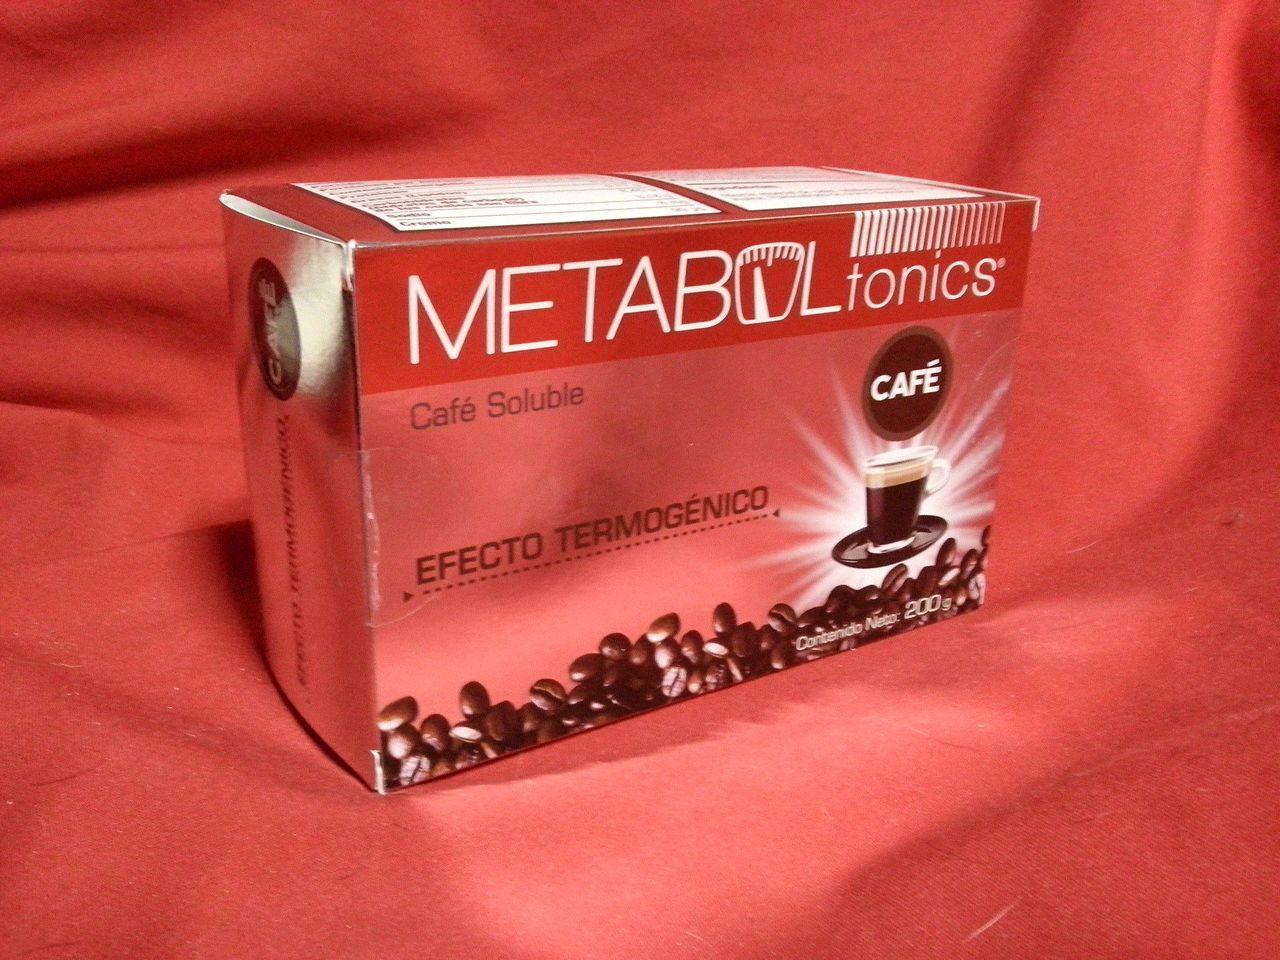 Walmart: Metaboltonics Café $29.03, Jeringa para pavo $25.01 y otros.